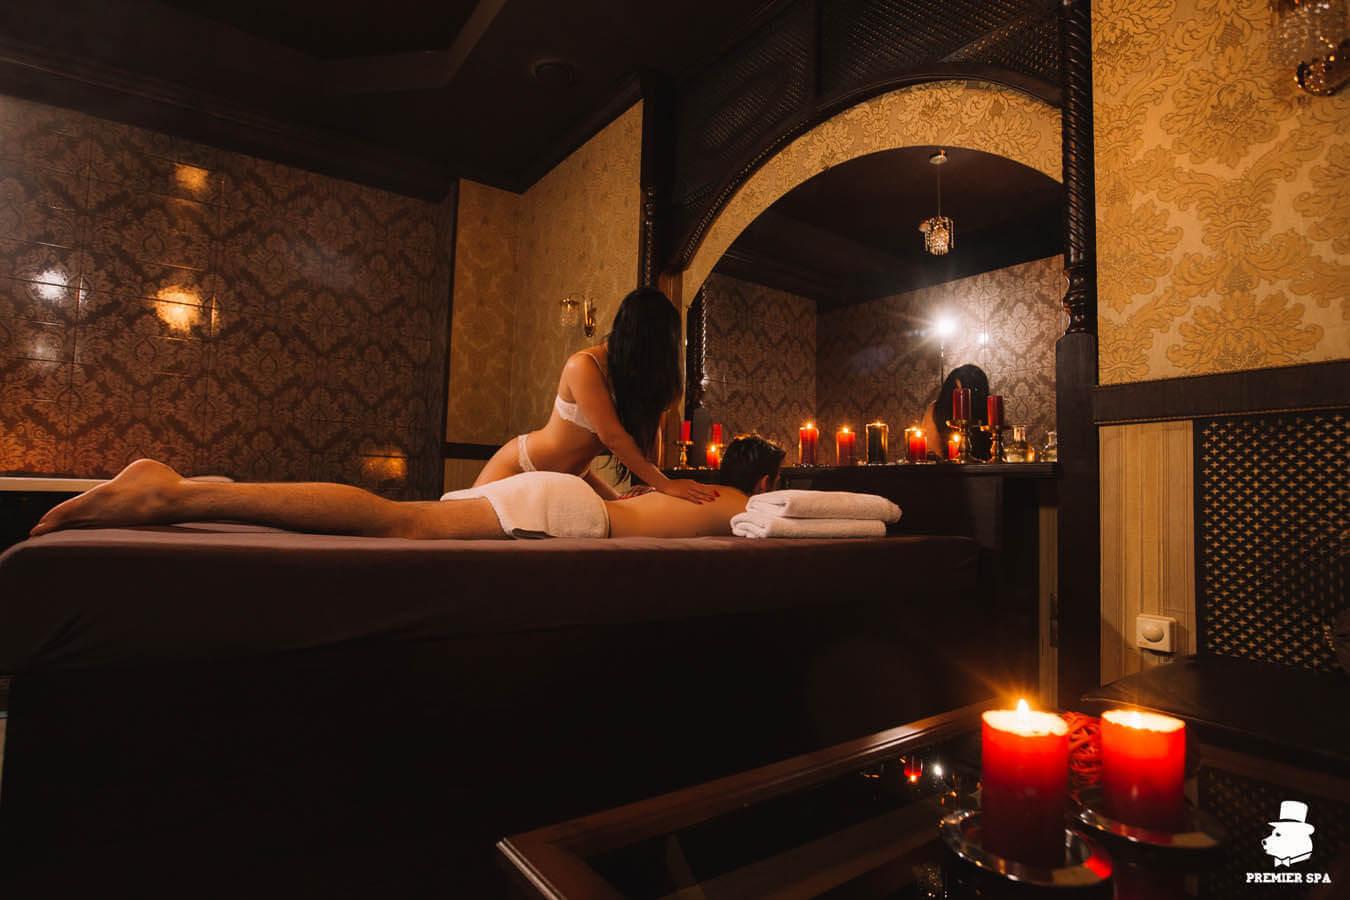 Расслабляющий массаж спины в мужском спа-салоне